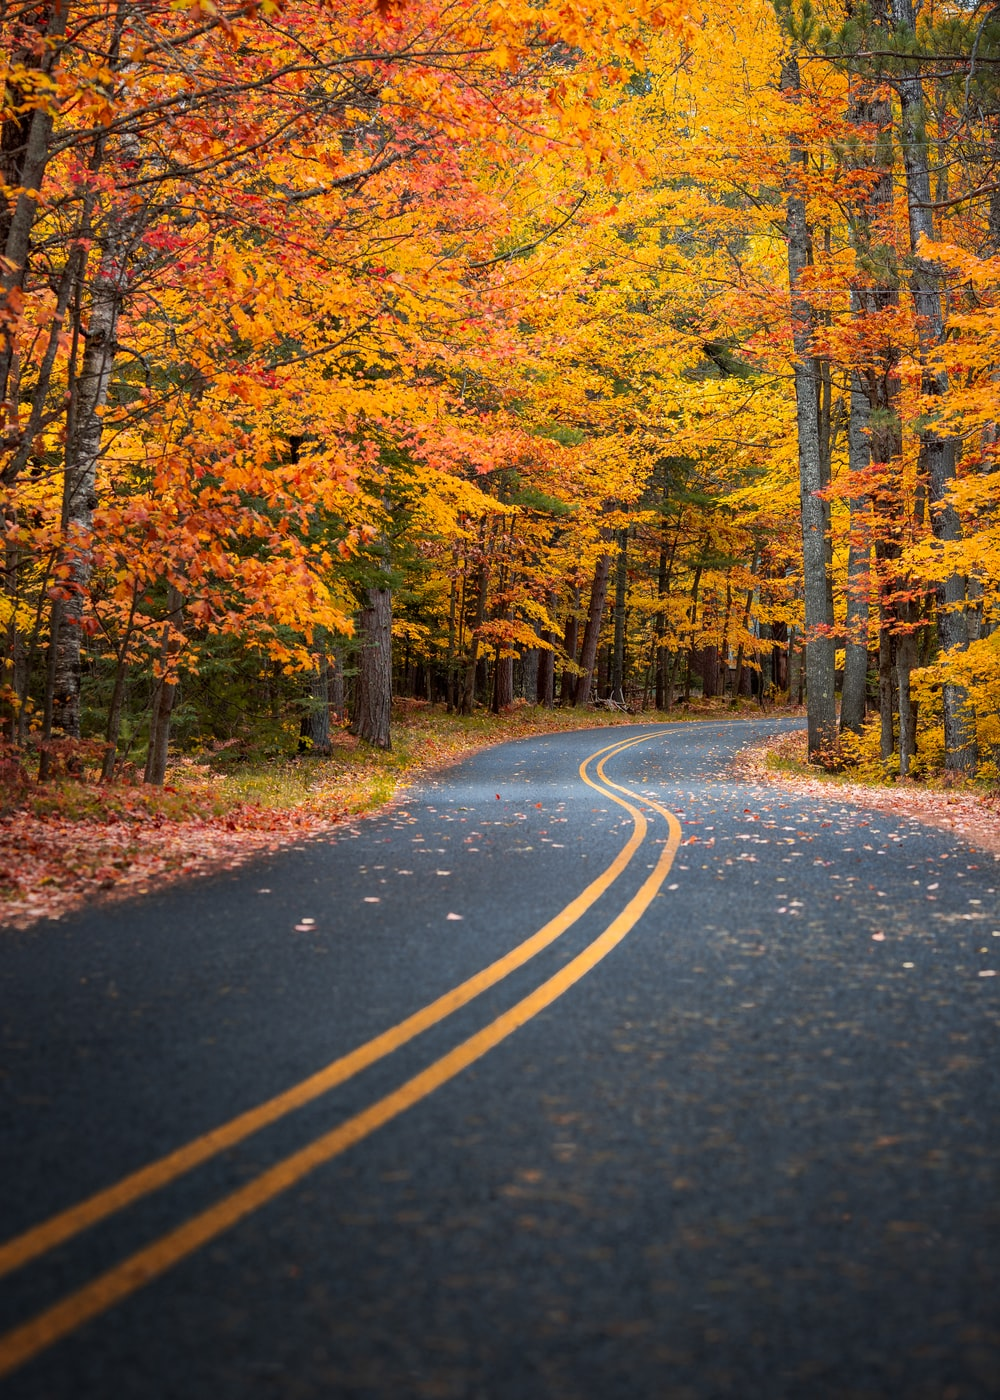 grey concrete road between orange-leafed trees